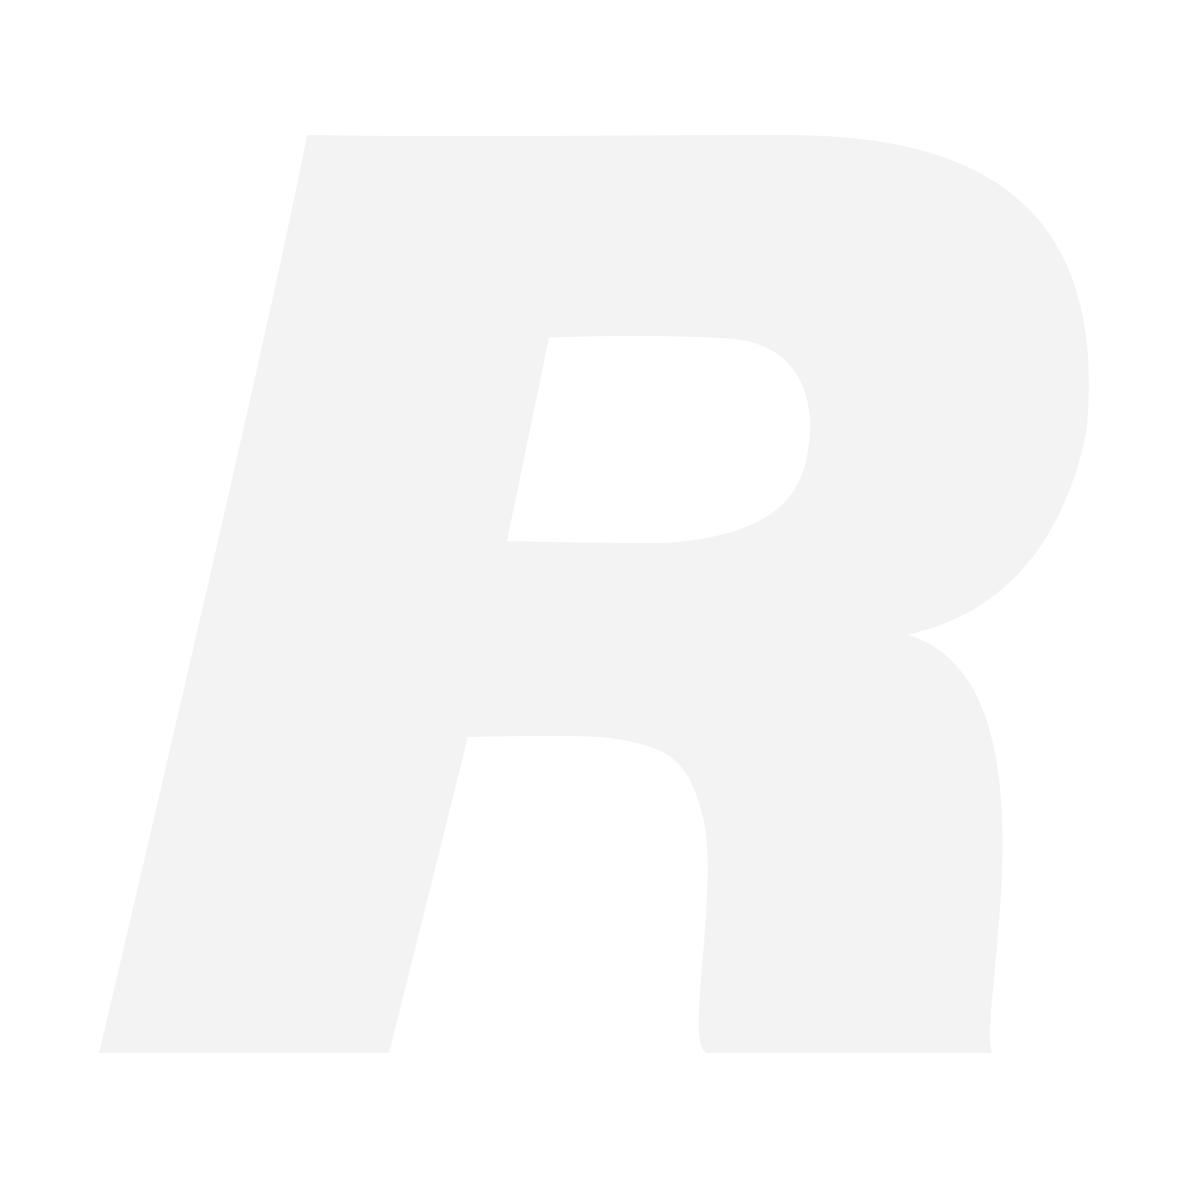 Sony AKA-RD1 vaihtokannet